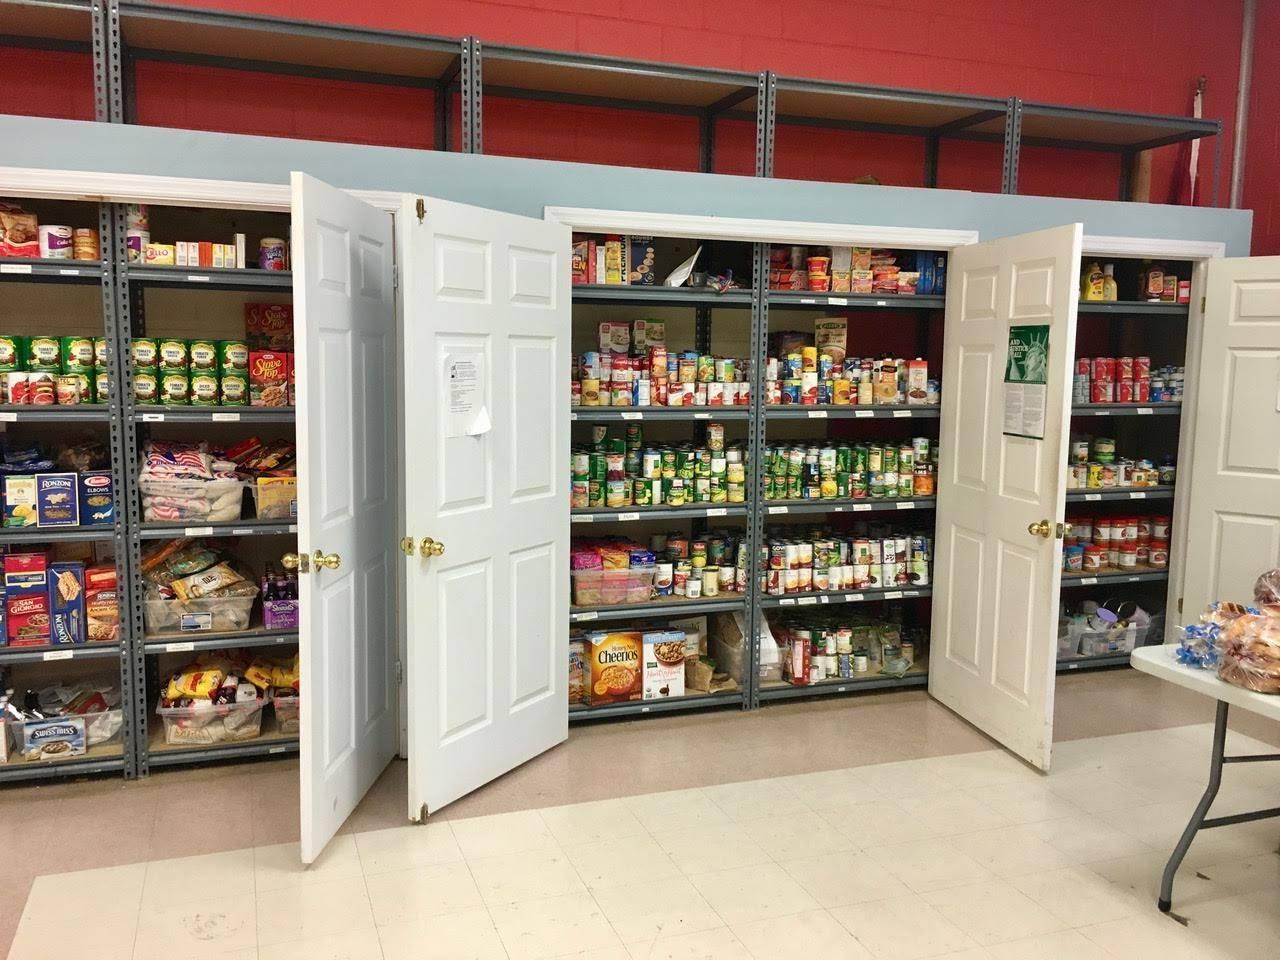 Highland Park Community Food Pantry